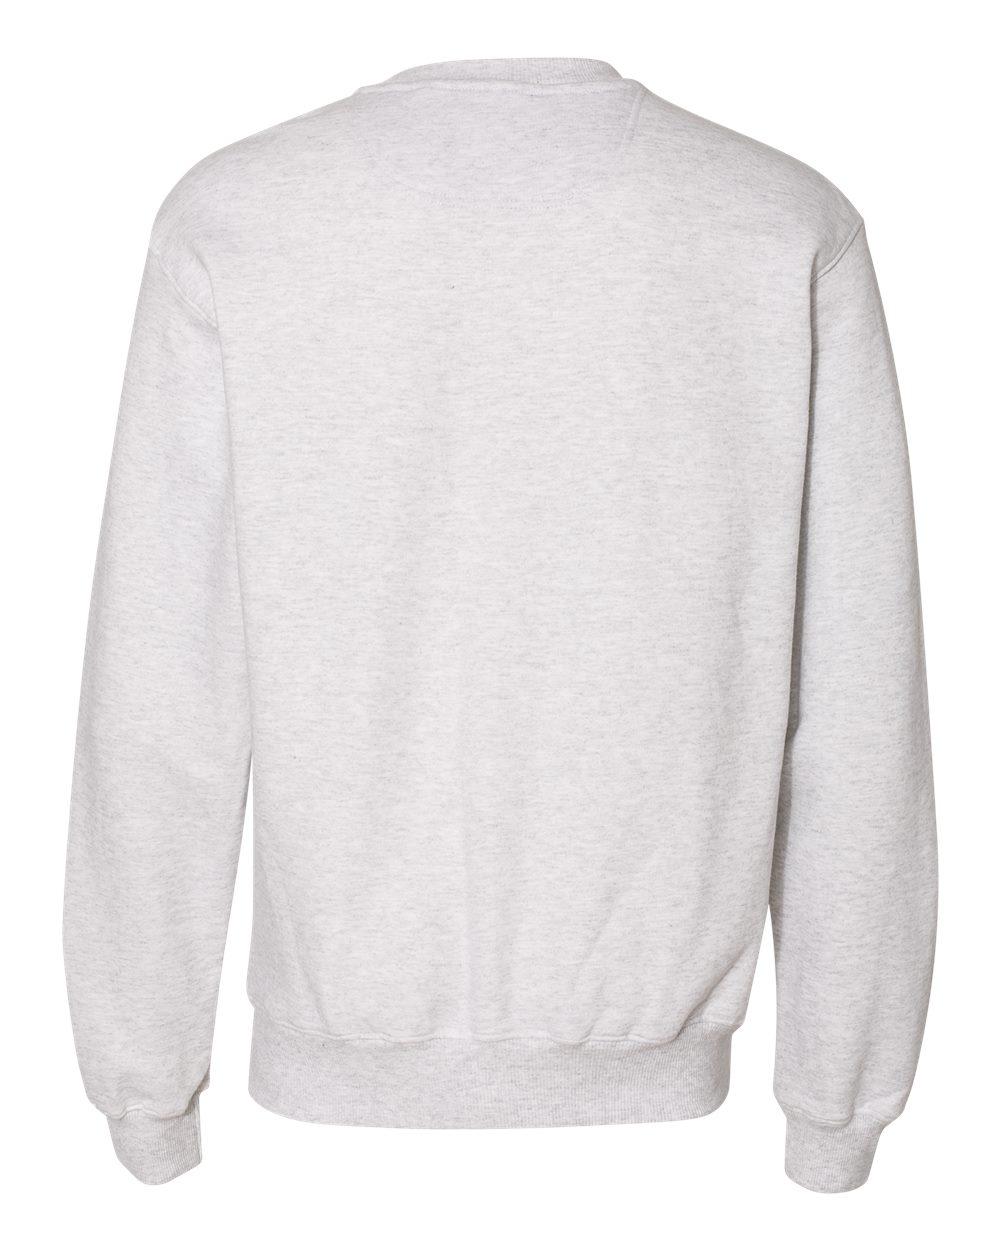 Champion-Mens-Cotton-Max-Crewneck-Sweatshirt-Pullover-S178-up-to-3XL miniature 16